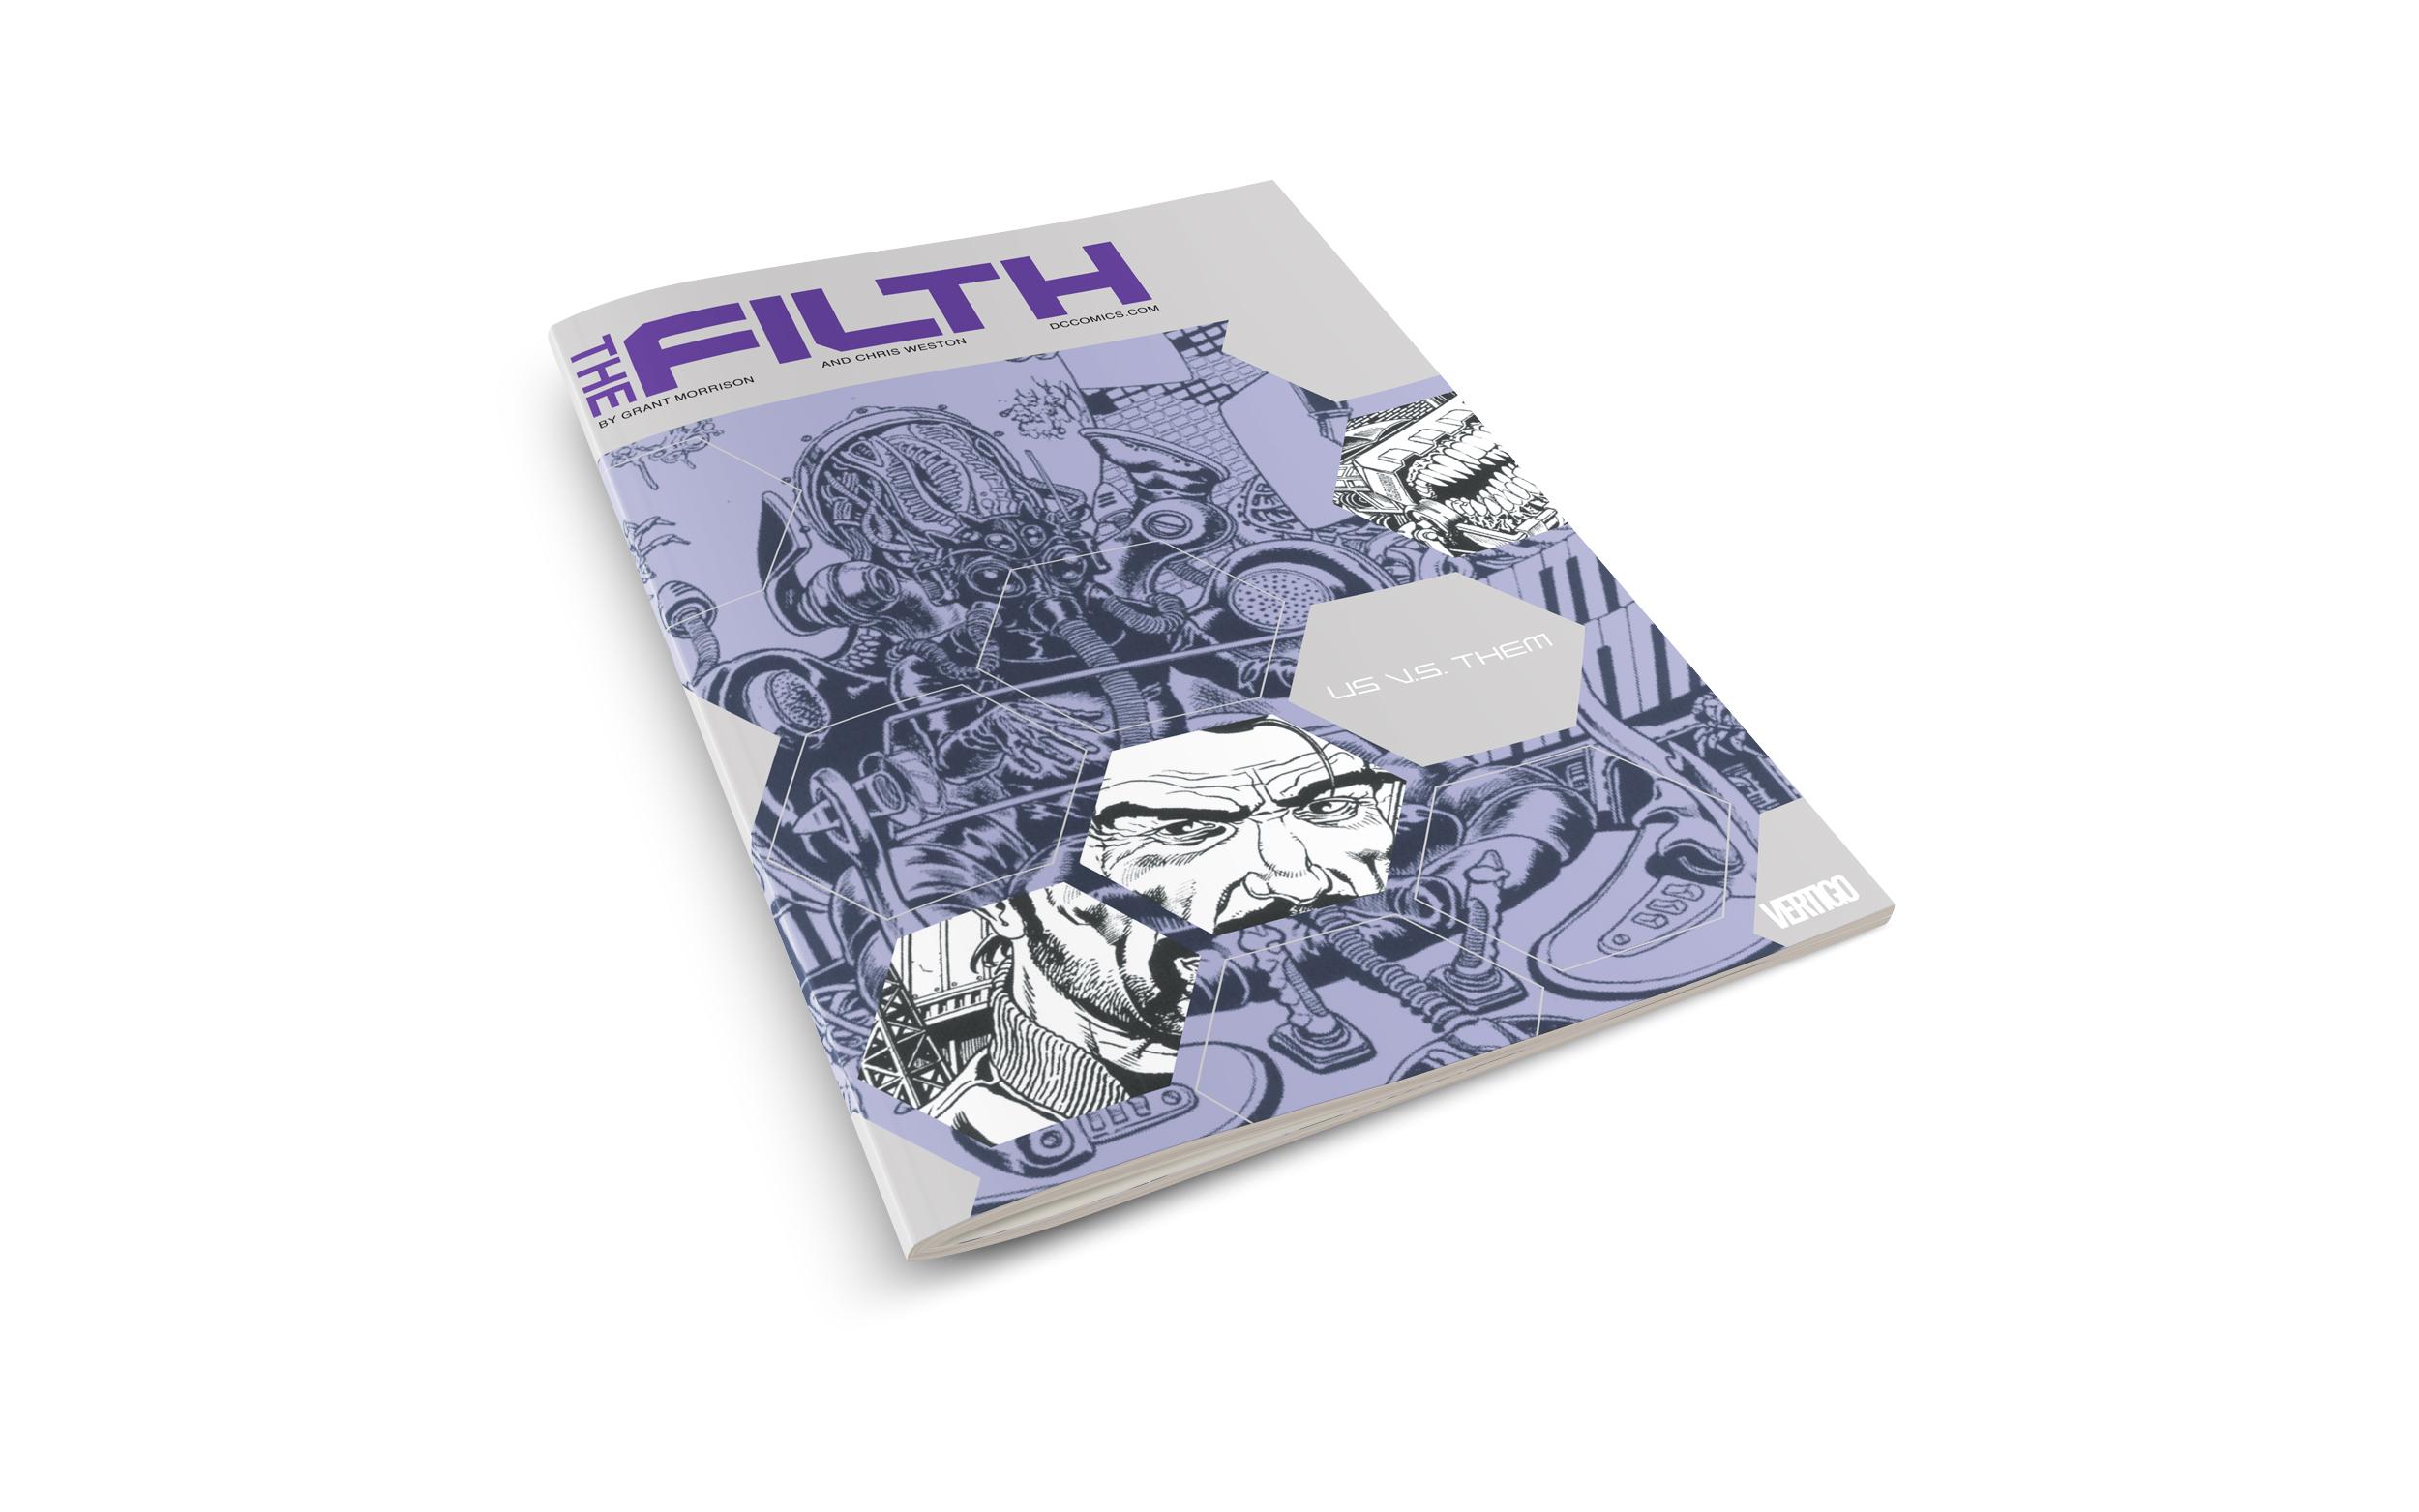 filth_us-vs-them_7_comp_2500w.jpg